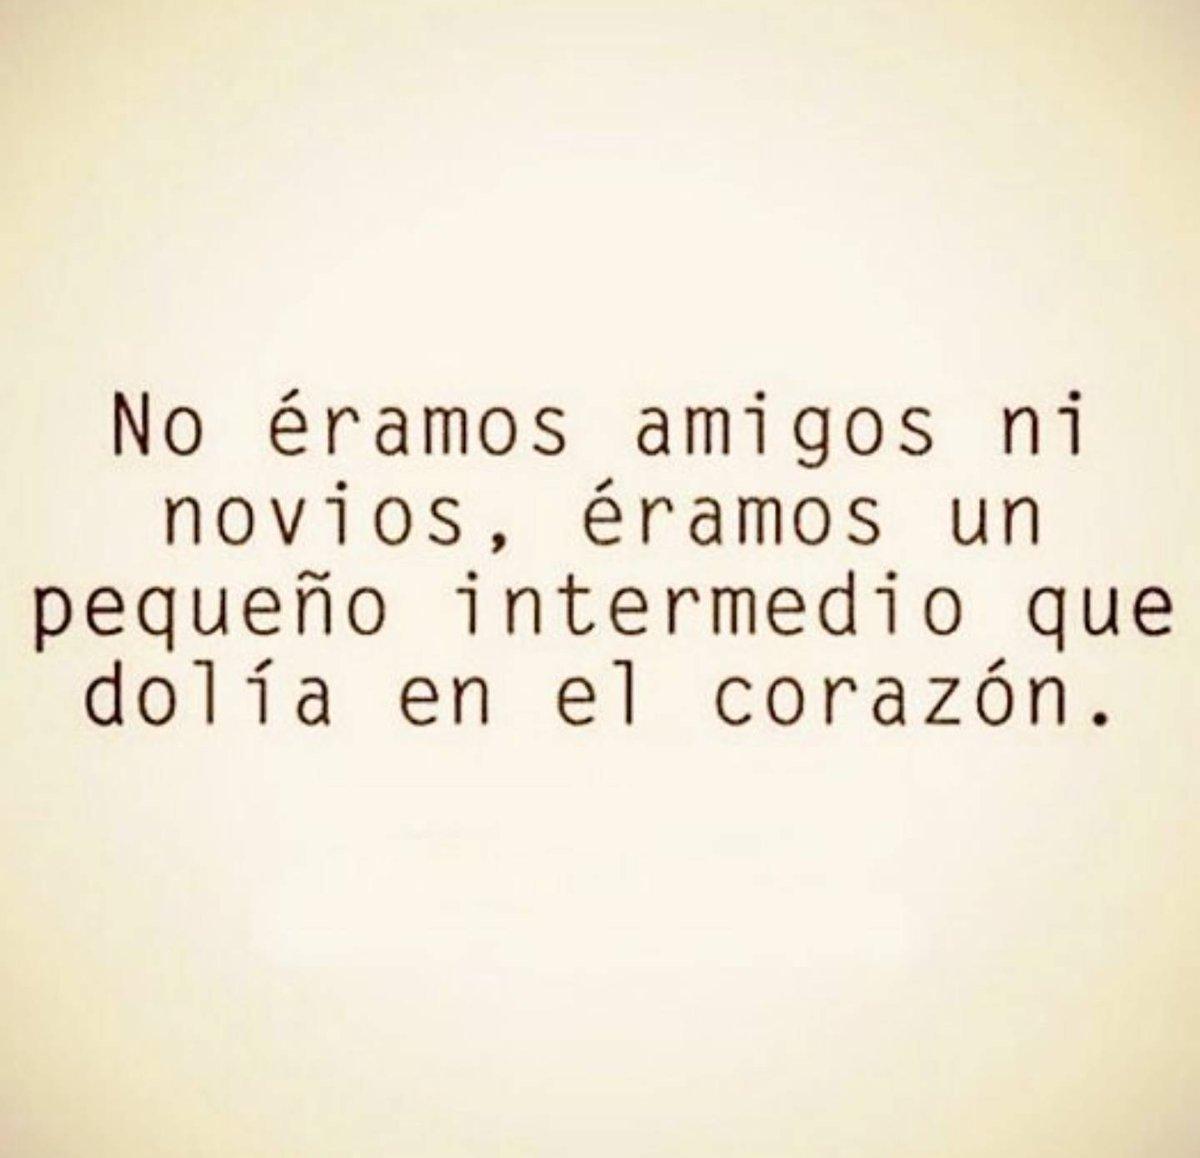 Quijotadas De Amor On Twitter Quijotadasdeamor Frases